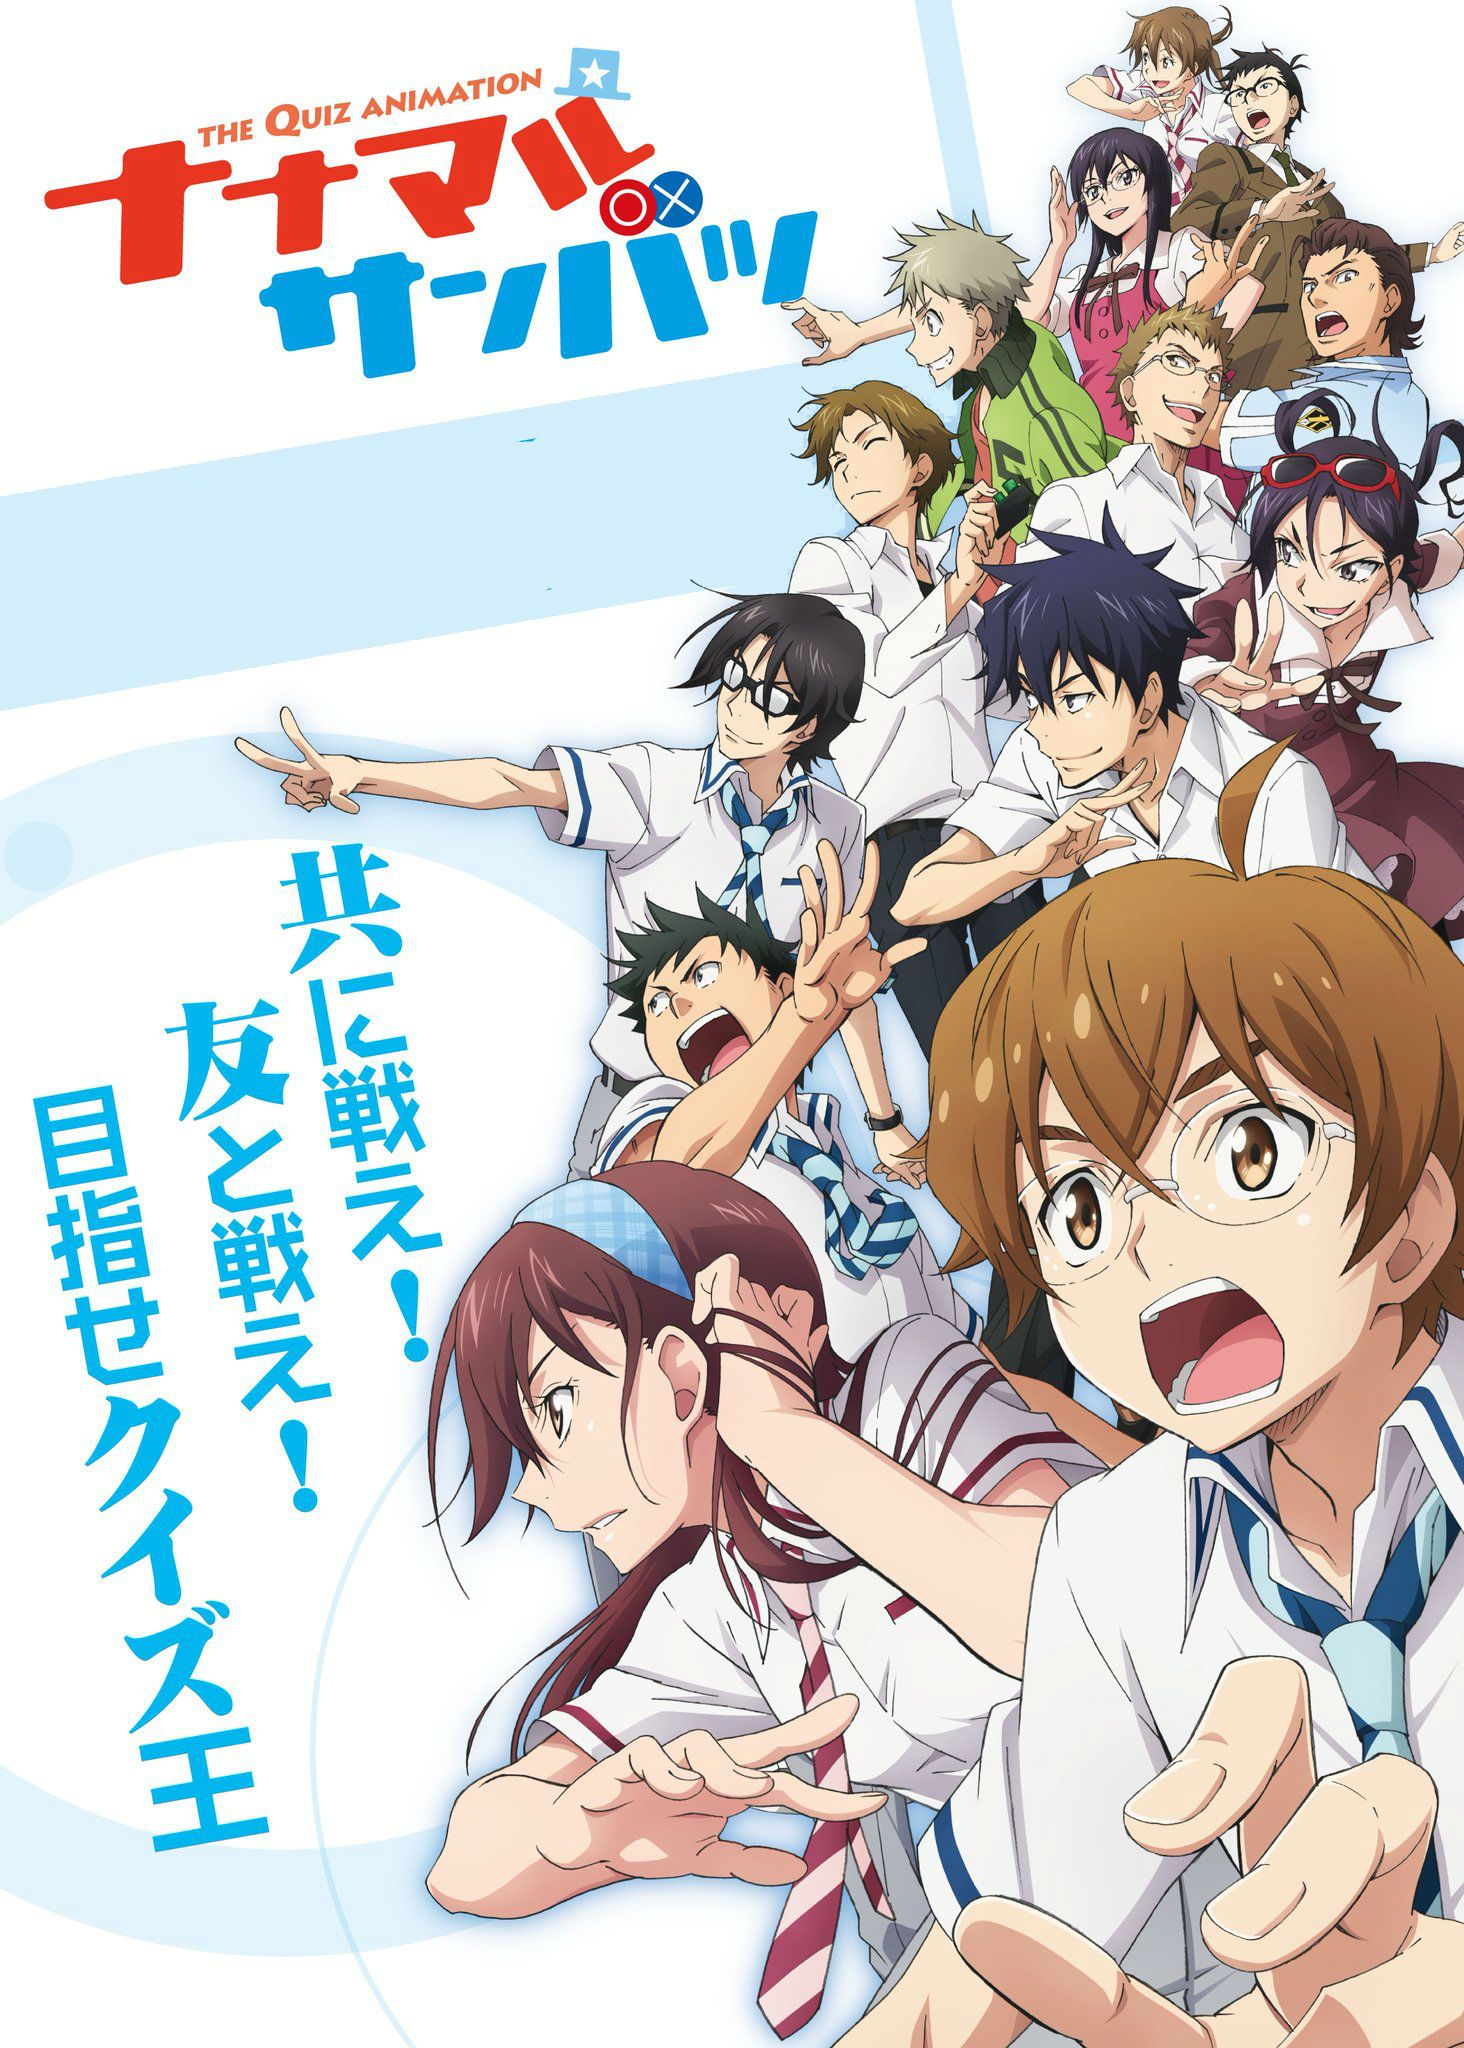 Nana maru san batsu 01 12 batch anime anime